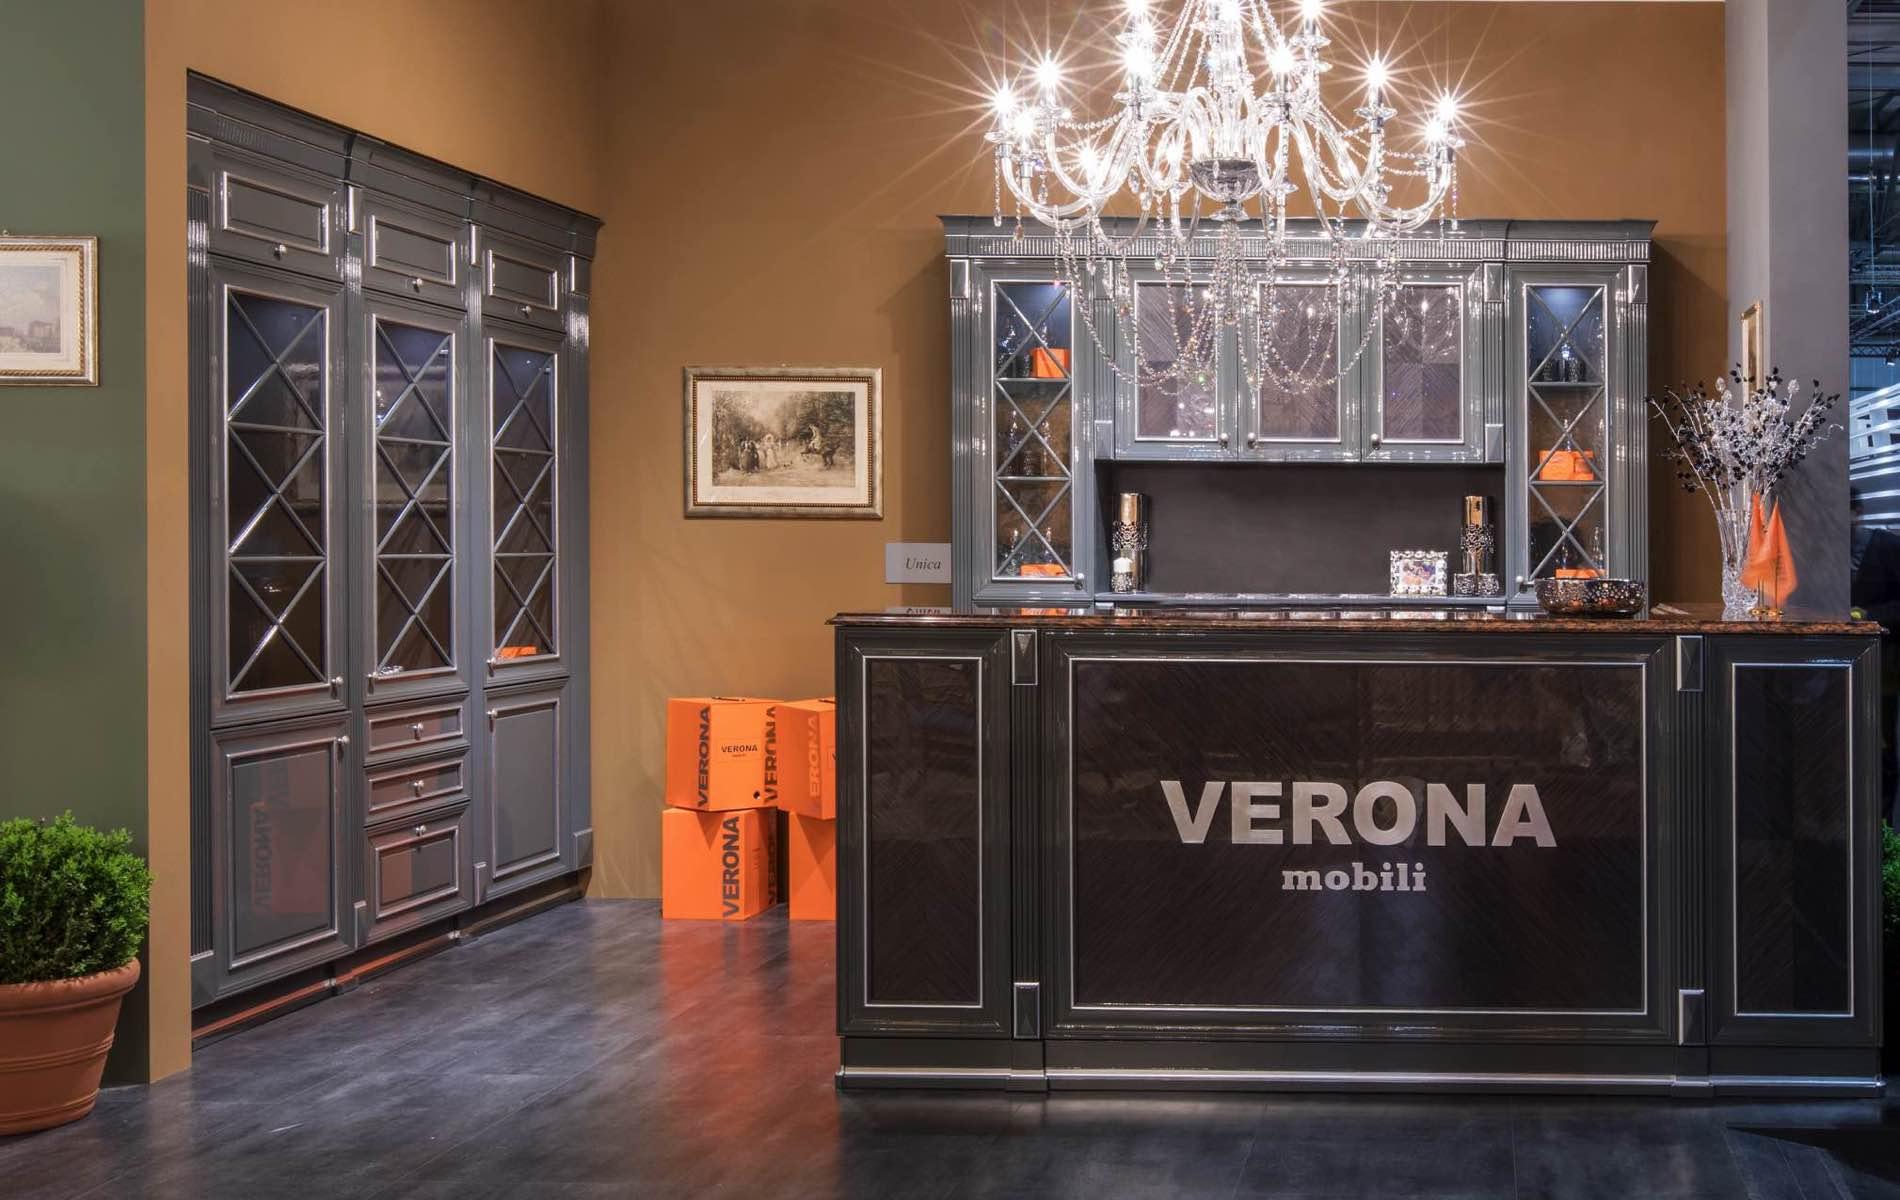 Verona mobili salone del mobile 2018 milano bottega for Negozi mobili verona